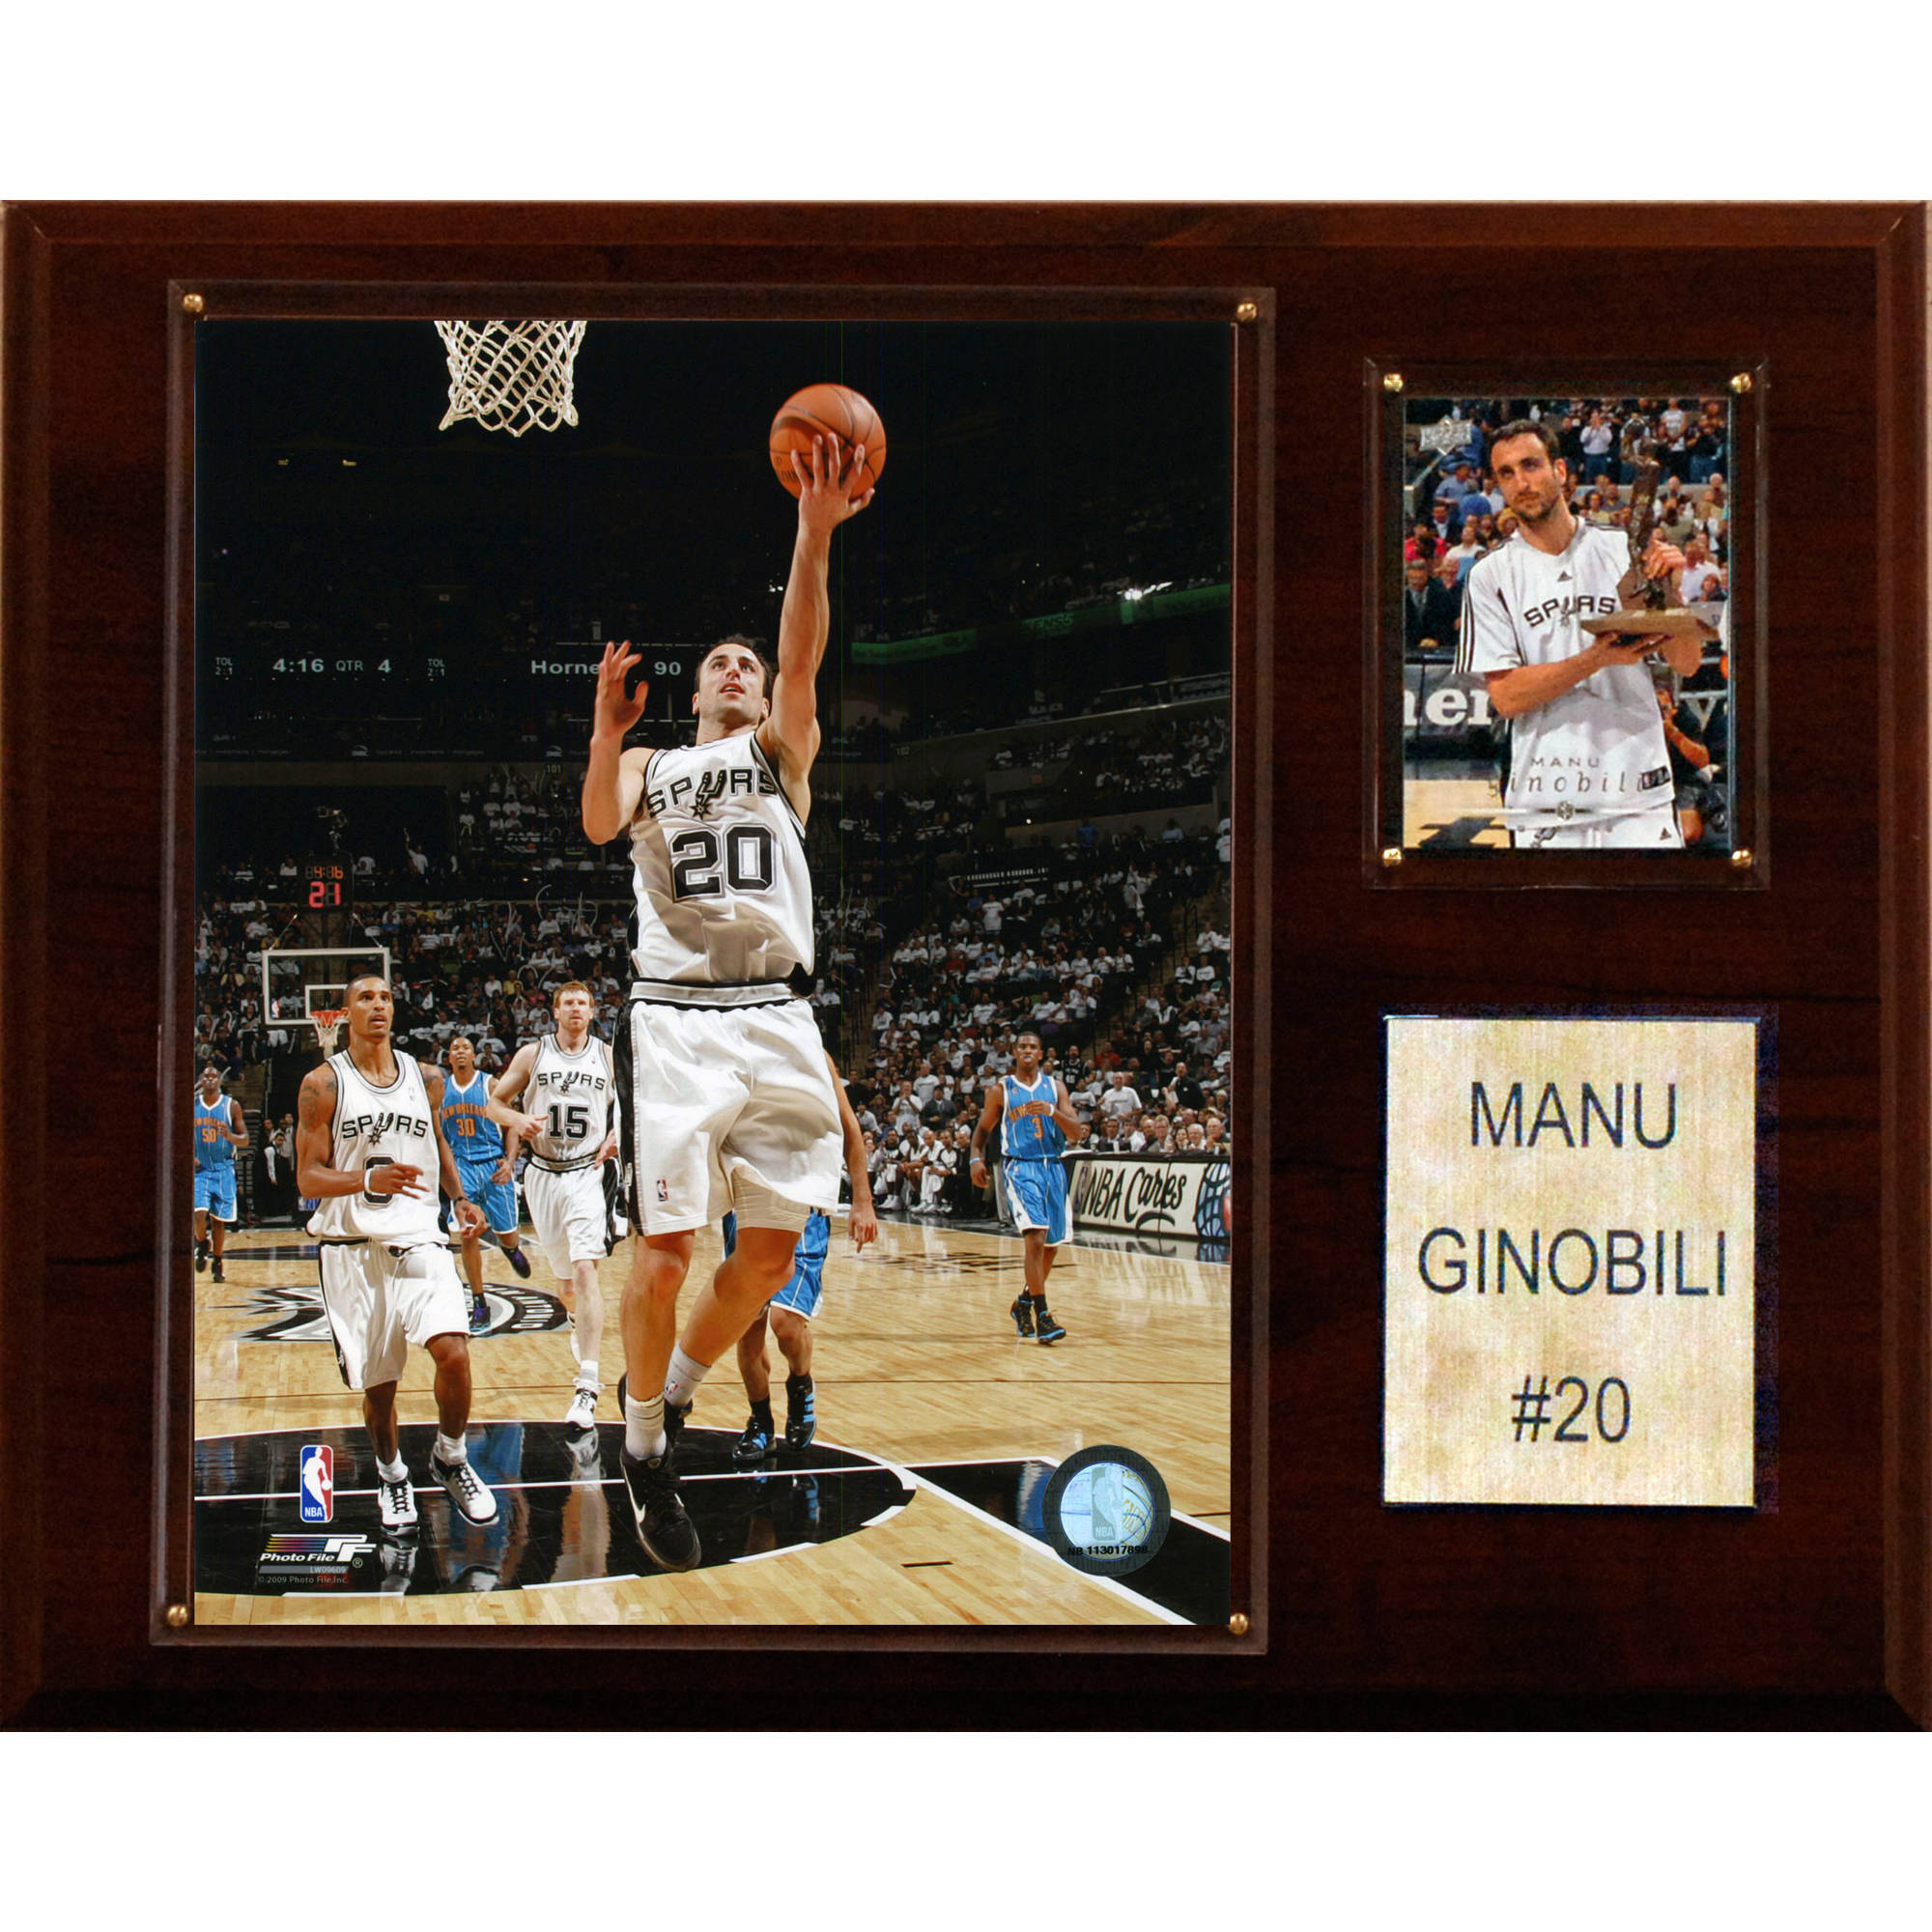 C&I Collectables NBA 12x15 Manu Ginobili San Antonio Spurs Player Plaque